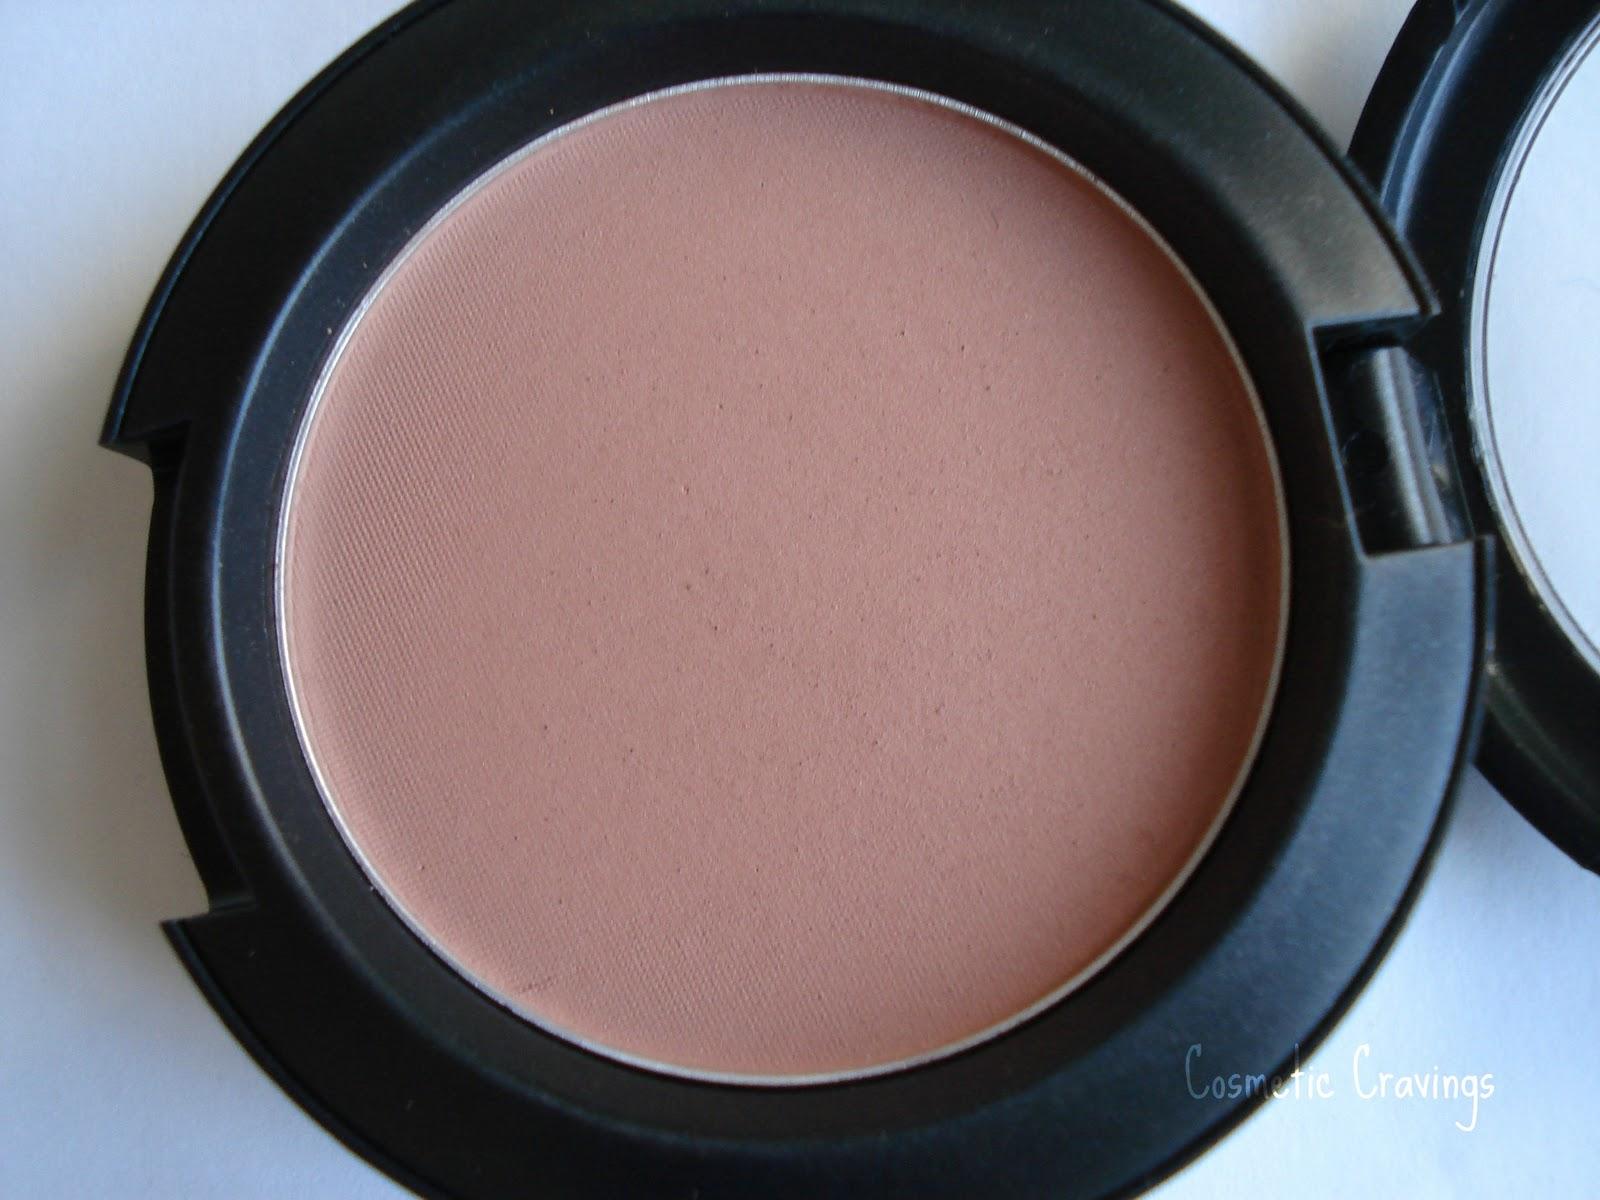 Cosmetic Cravings: Review: Mac Blushbaby Sheertone Blush